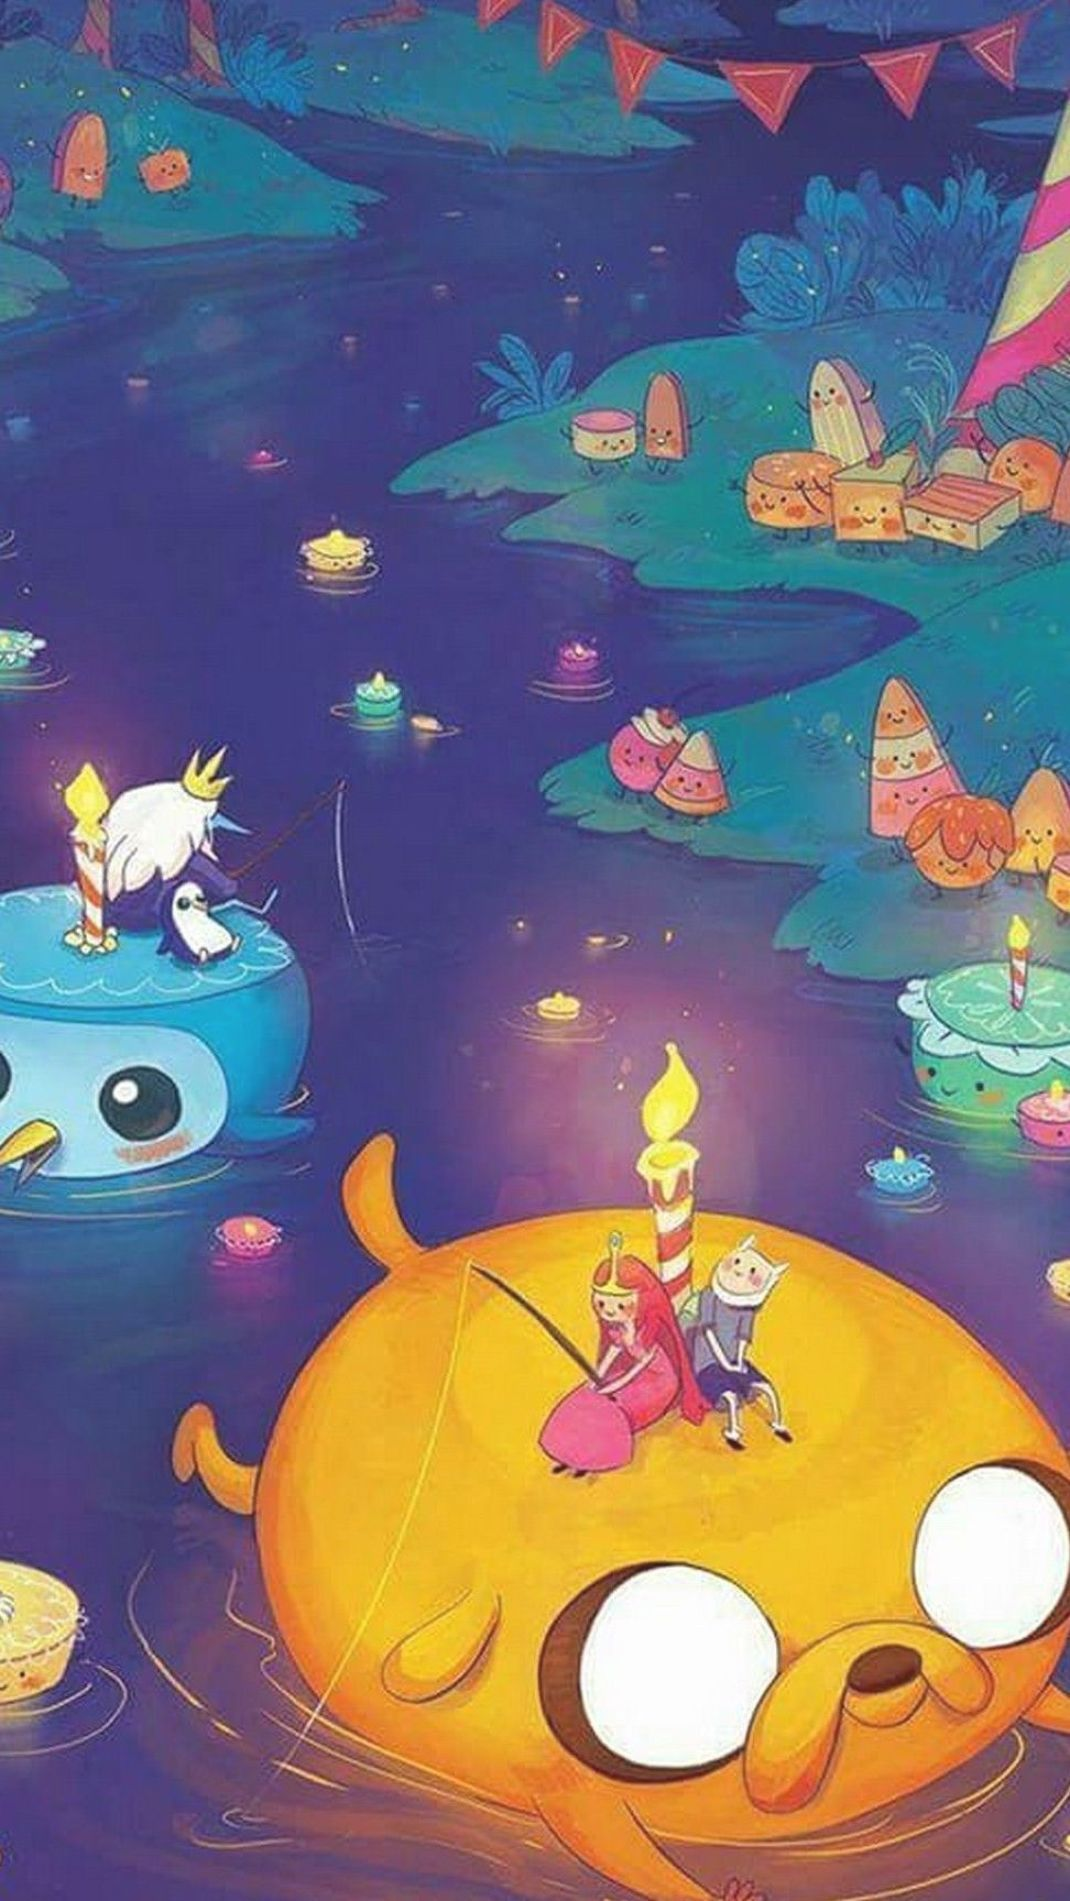 Adventure Time Tapete Iphone Hd Best Wallpaper Hd Papeis De Parede